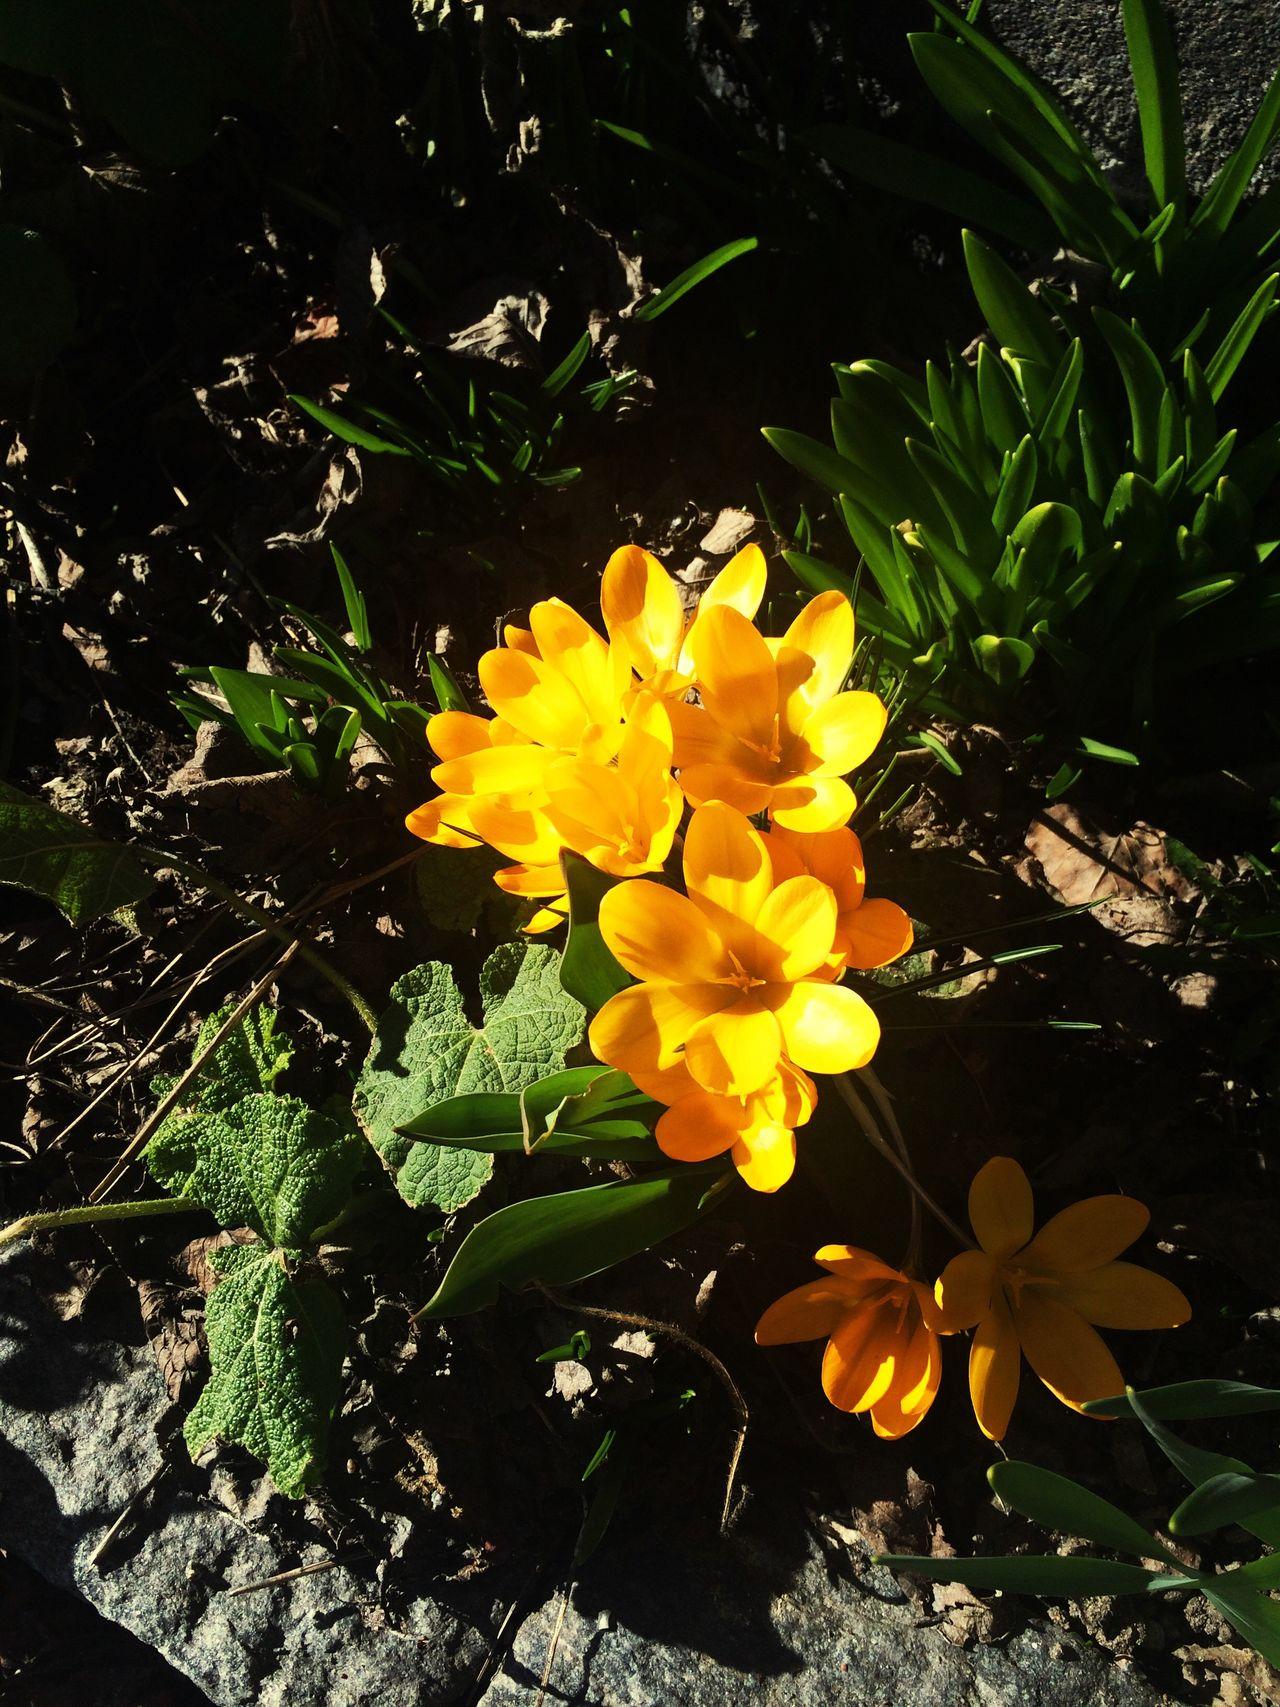 Flower Nature Fragility Plant Beauty In Nature Growth Yellow Outdoors Blooming Krokus Springtime Spring Flowers Spring Is Coming  Spring Is In The Air EyeEm Gallery EyeEmFlower